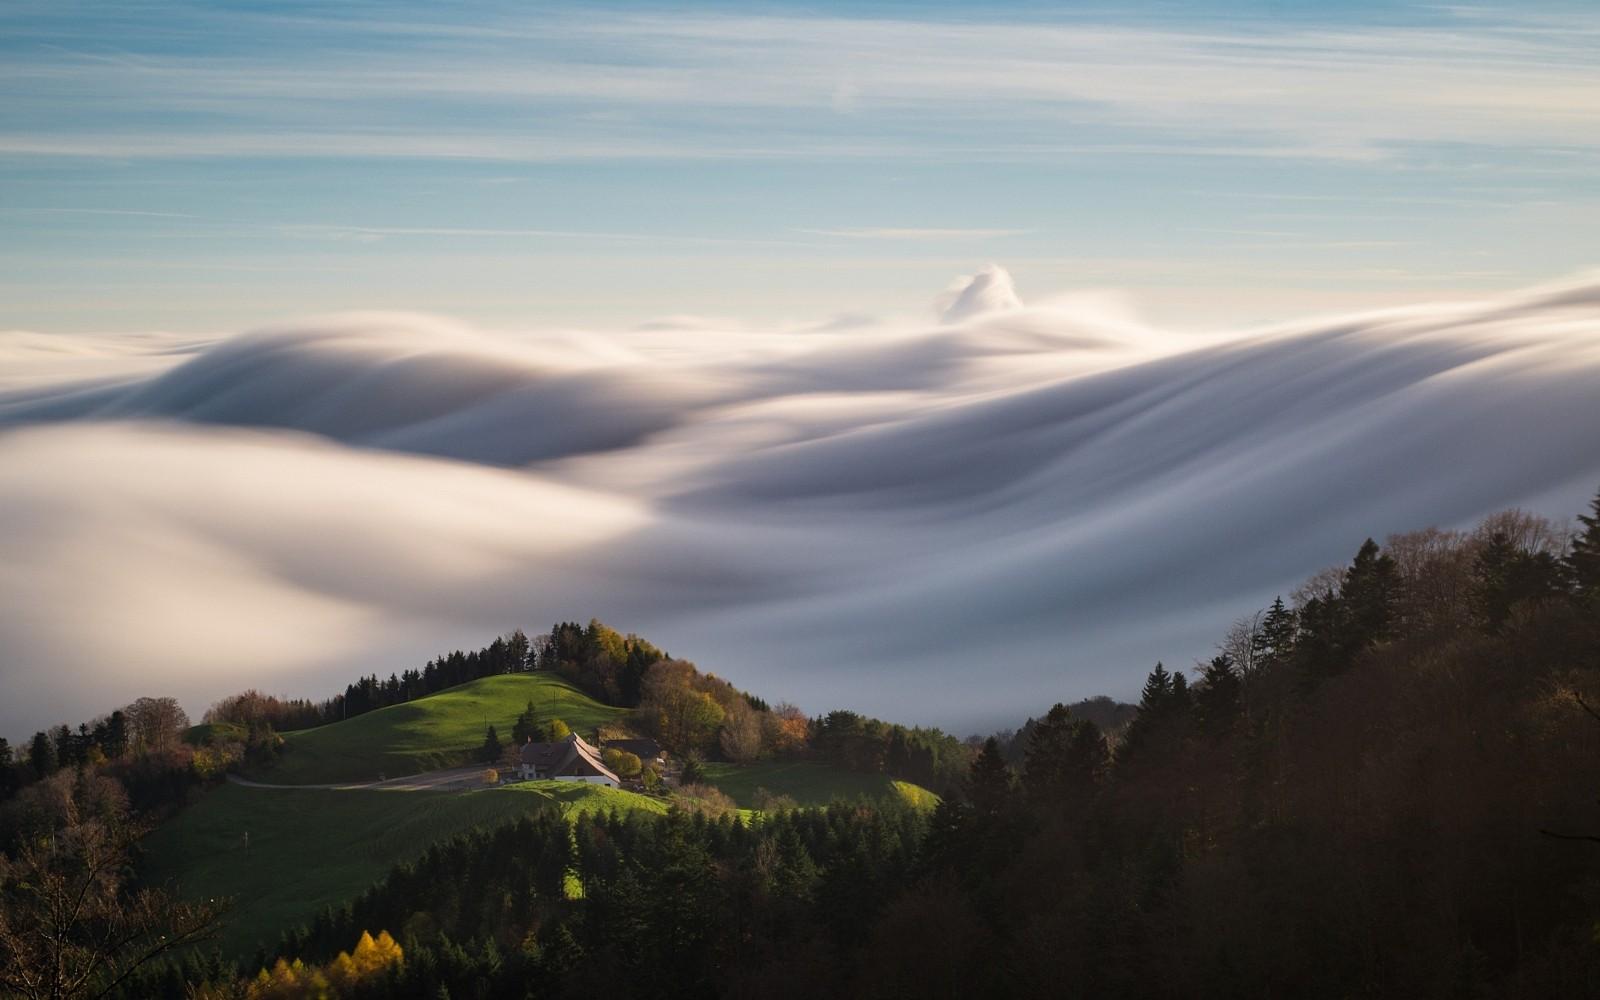 General 1600x1000 nature landscape hills forest grass sunlight clouds waves fall sunset house